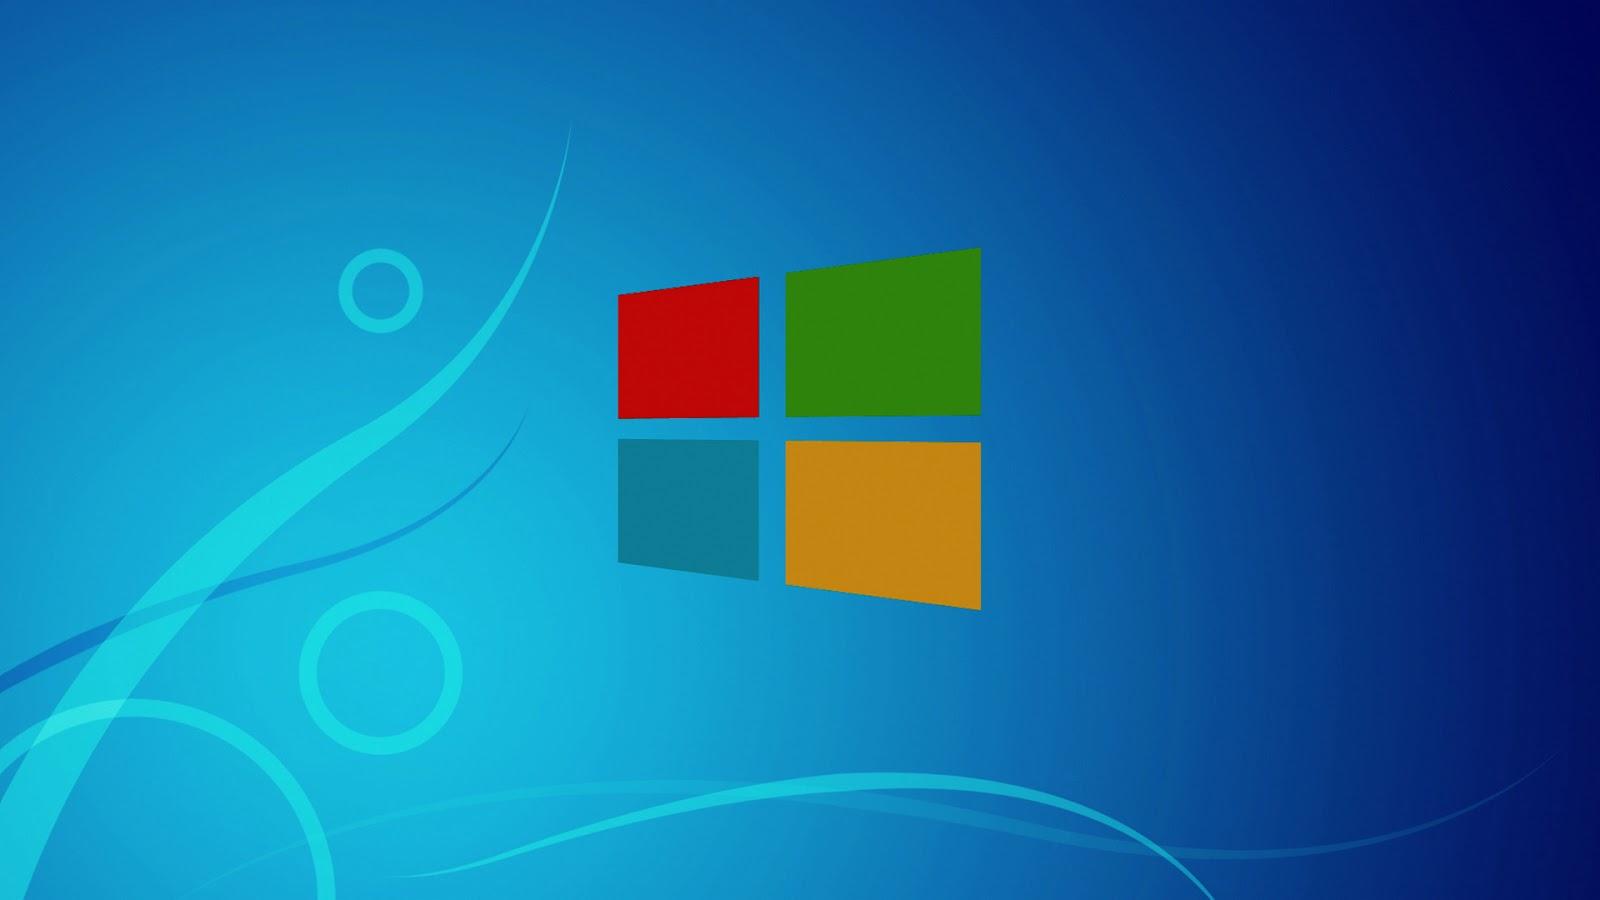 Windows 8 HD Wallpaper 1080p Galerry Wallpaper 1600x900